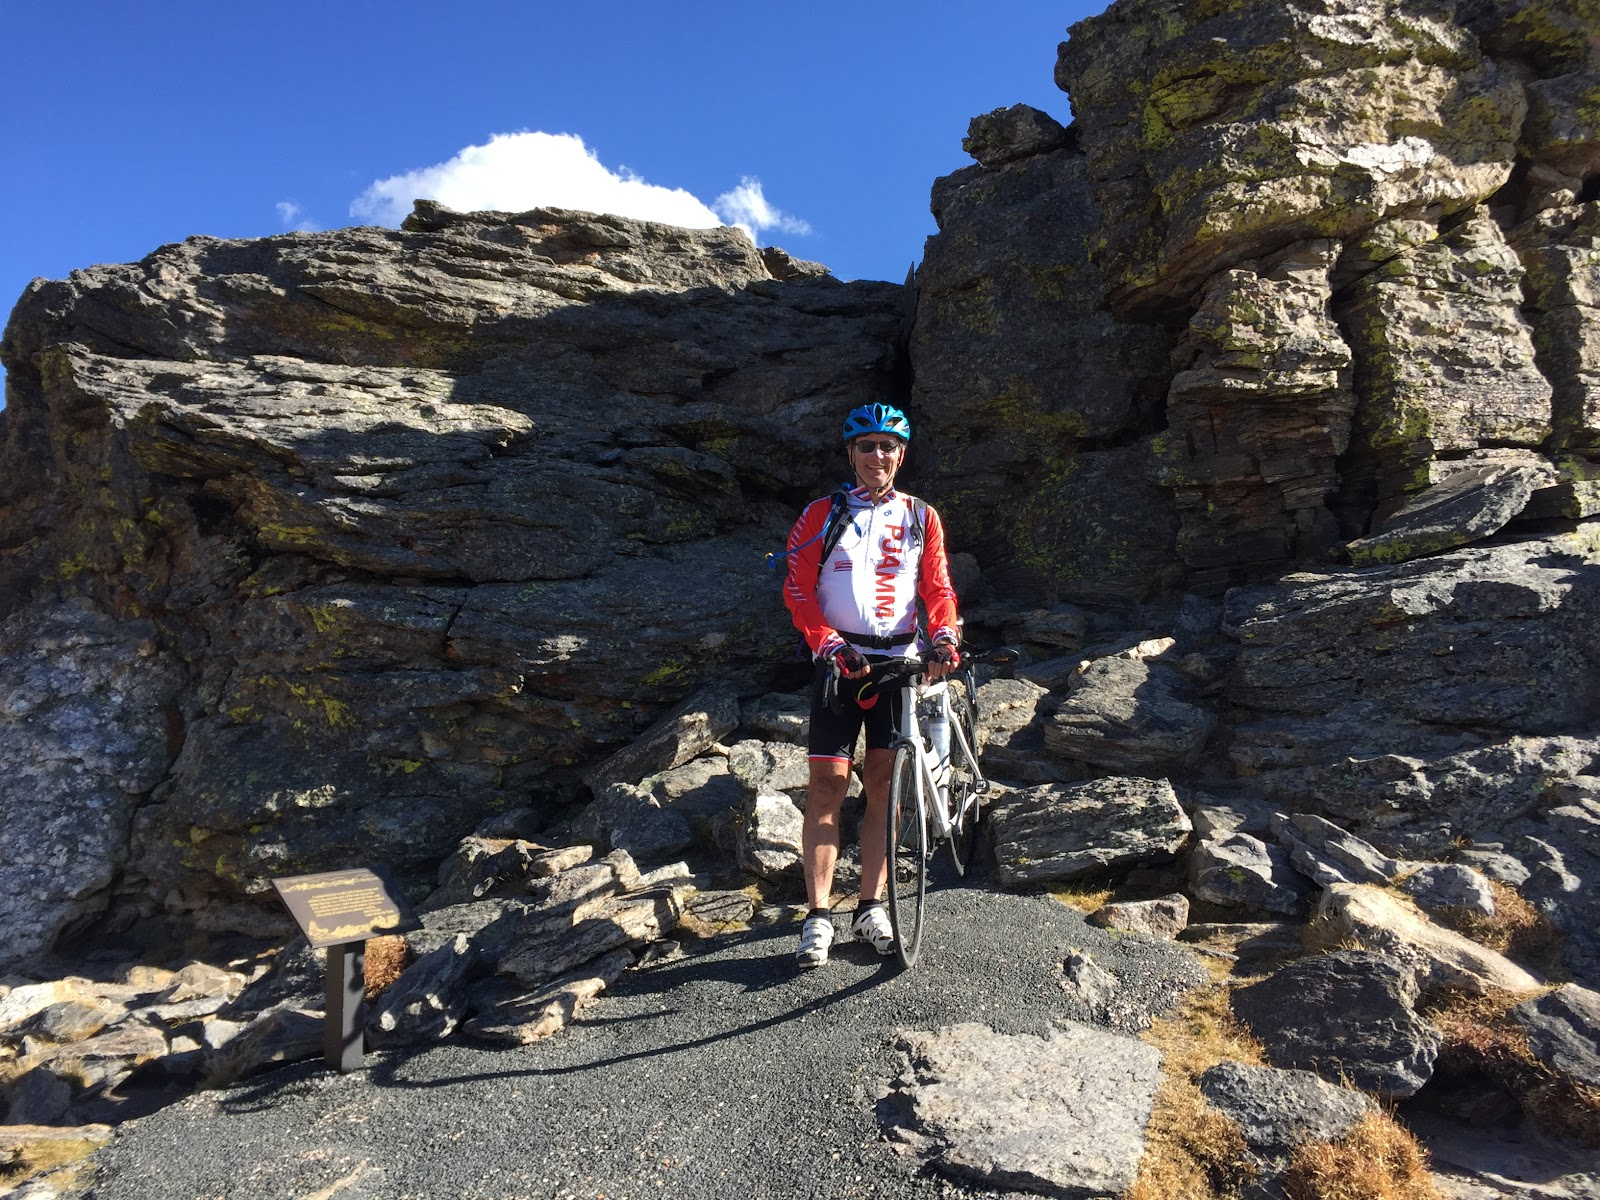 Bruce Hamilton hiking to high point of Trail Ridge